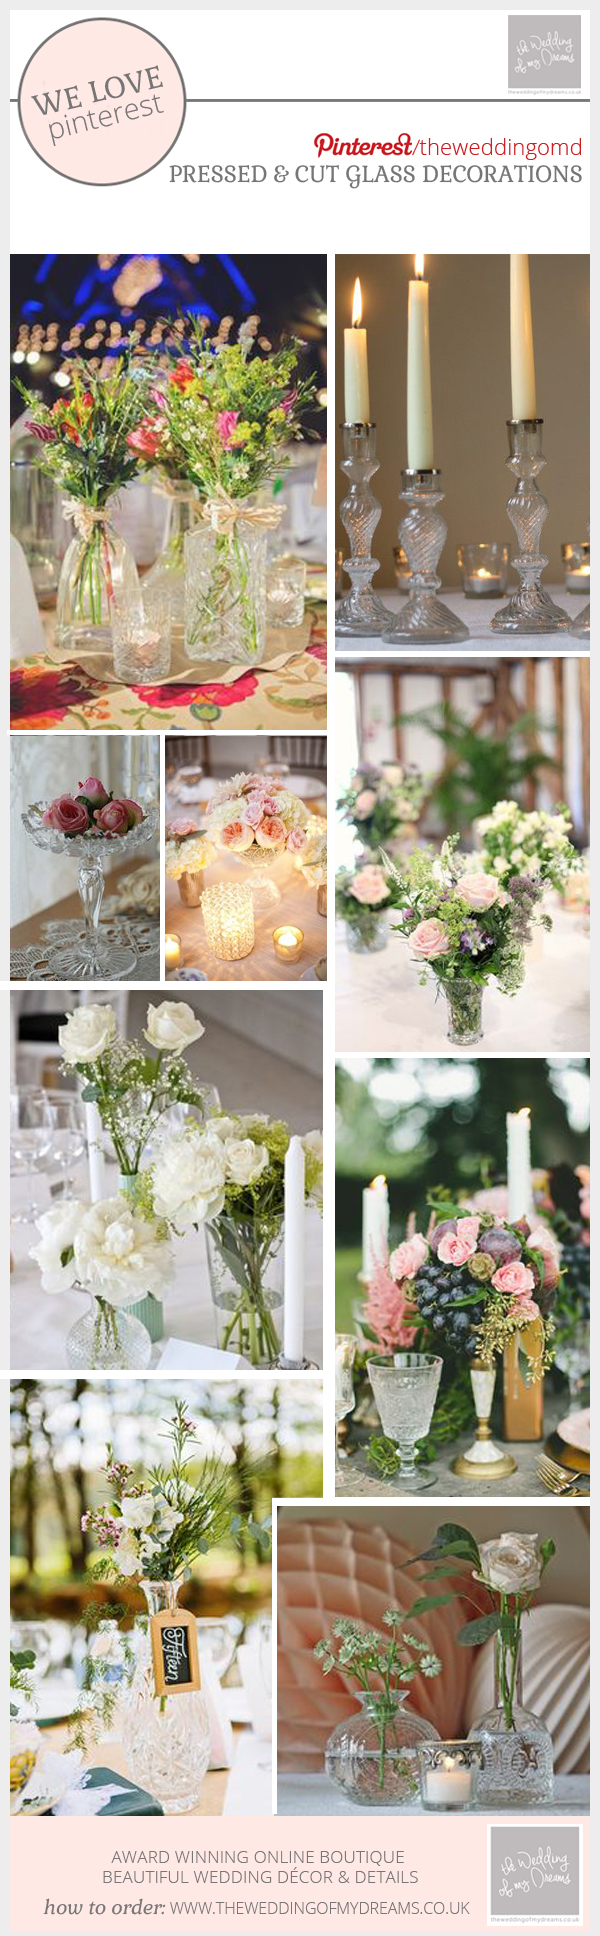 pressed cut glass wedding decorations